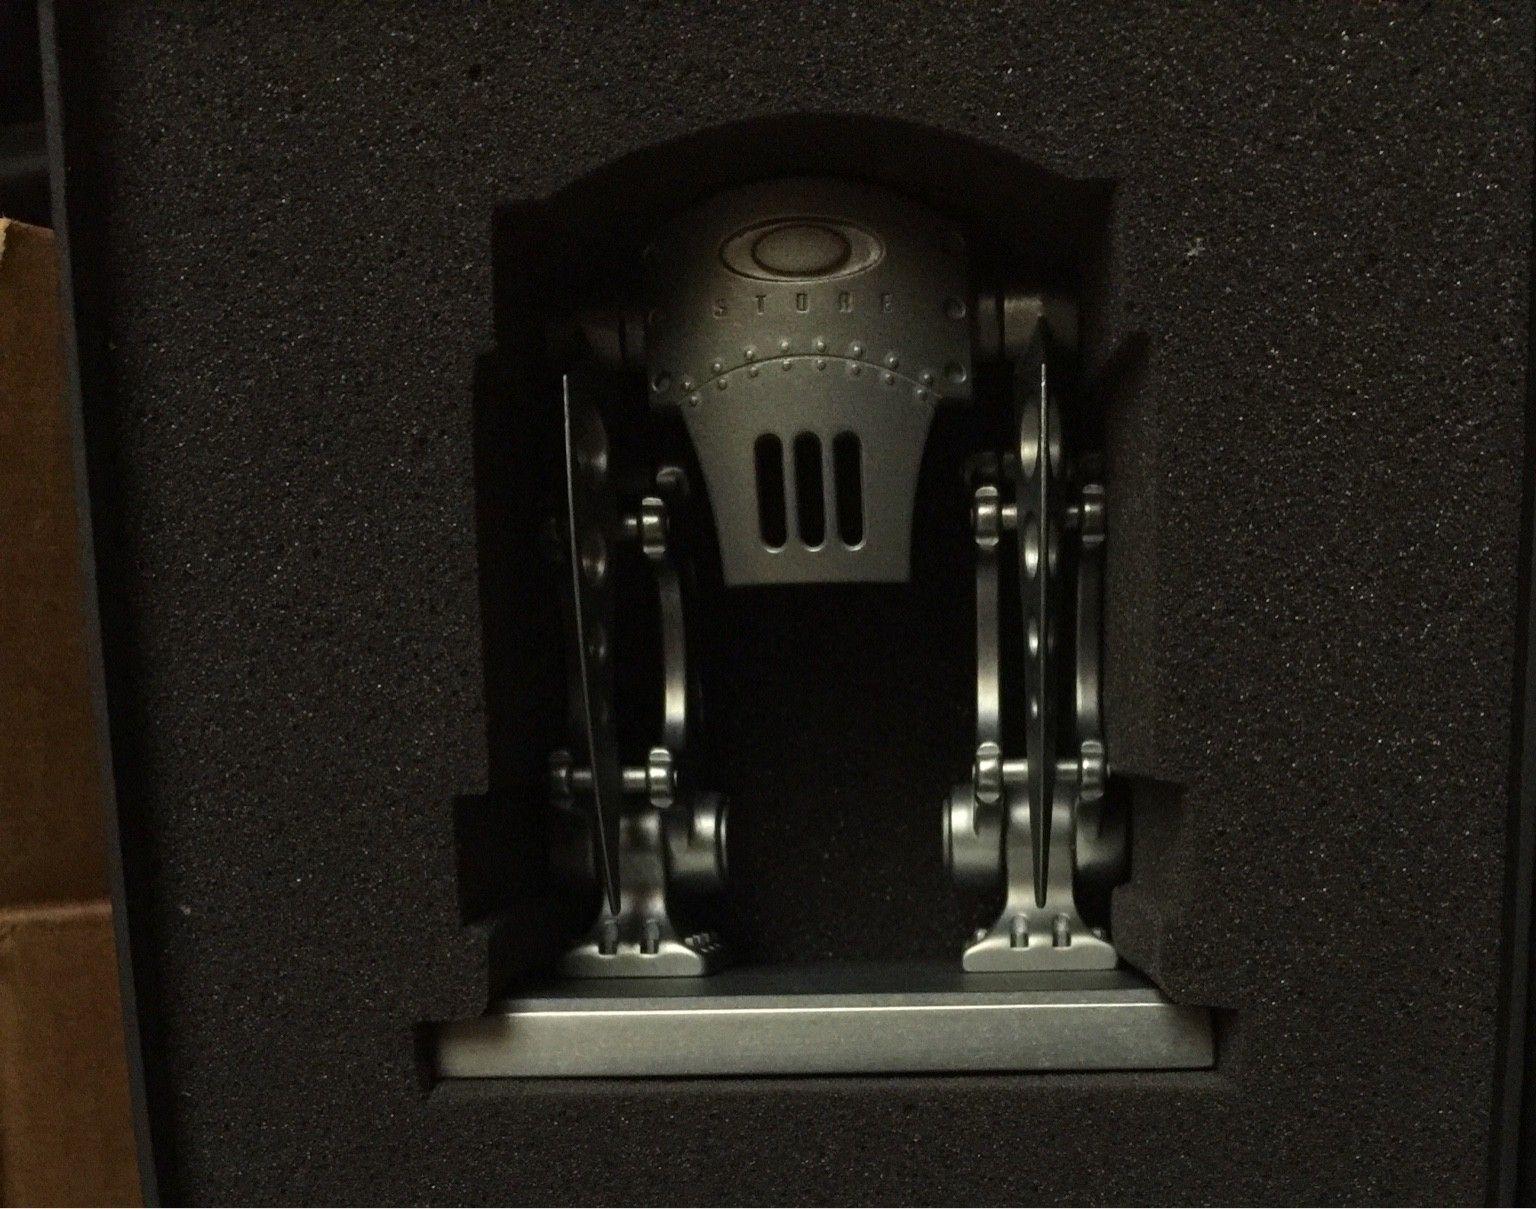 Robot for Cube - cc511ceddac2e8b6382985d00851e089.jpg